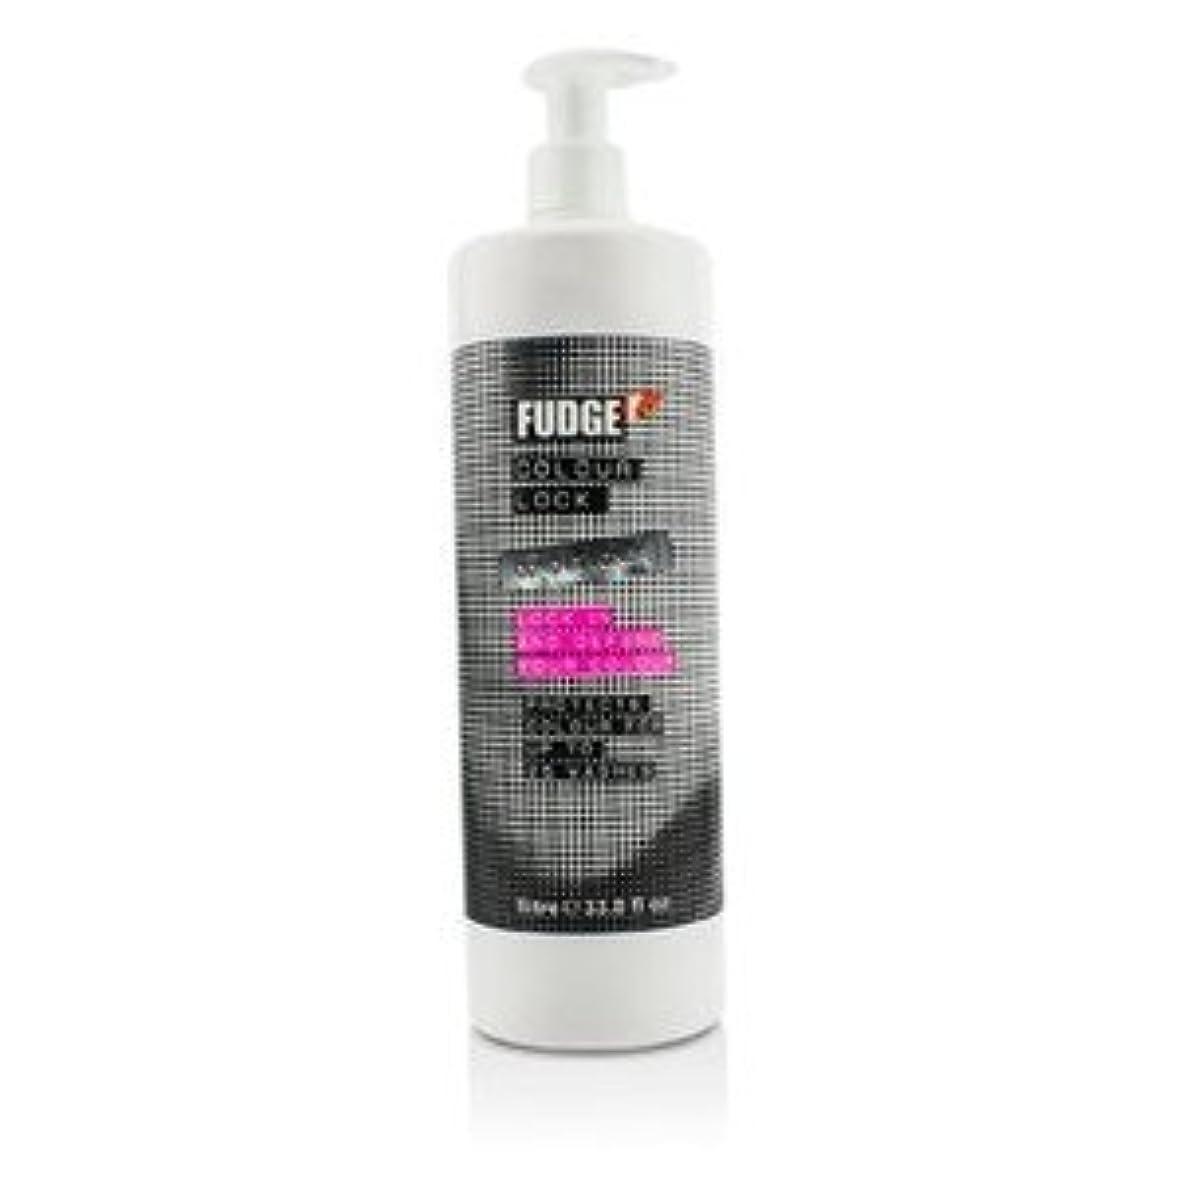 Fudge カラー ロック コンディショナー(For Lasting Vibrancy&Colour Happy Hair) 1000ml/33.8oz [並行輸入品]